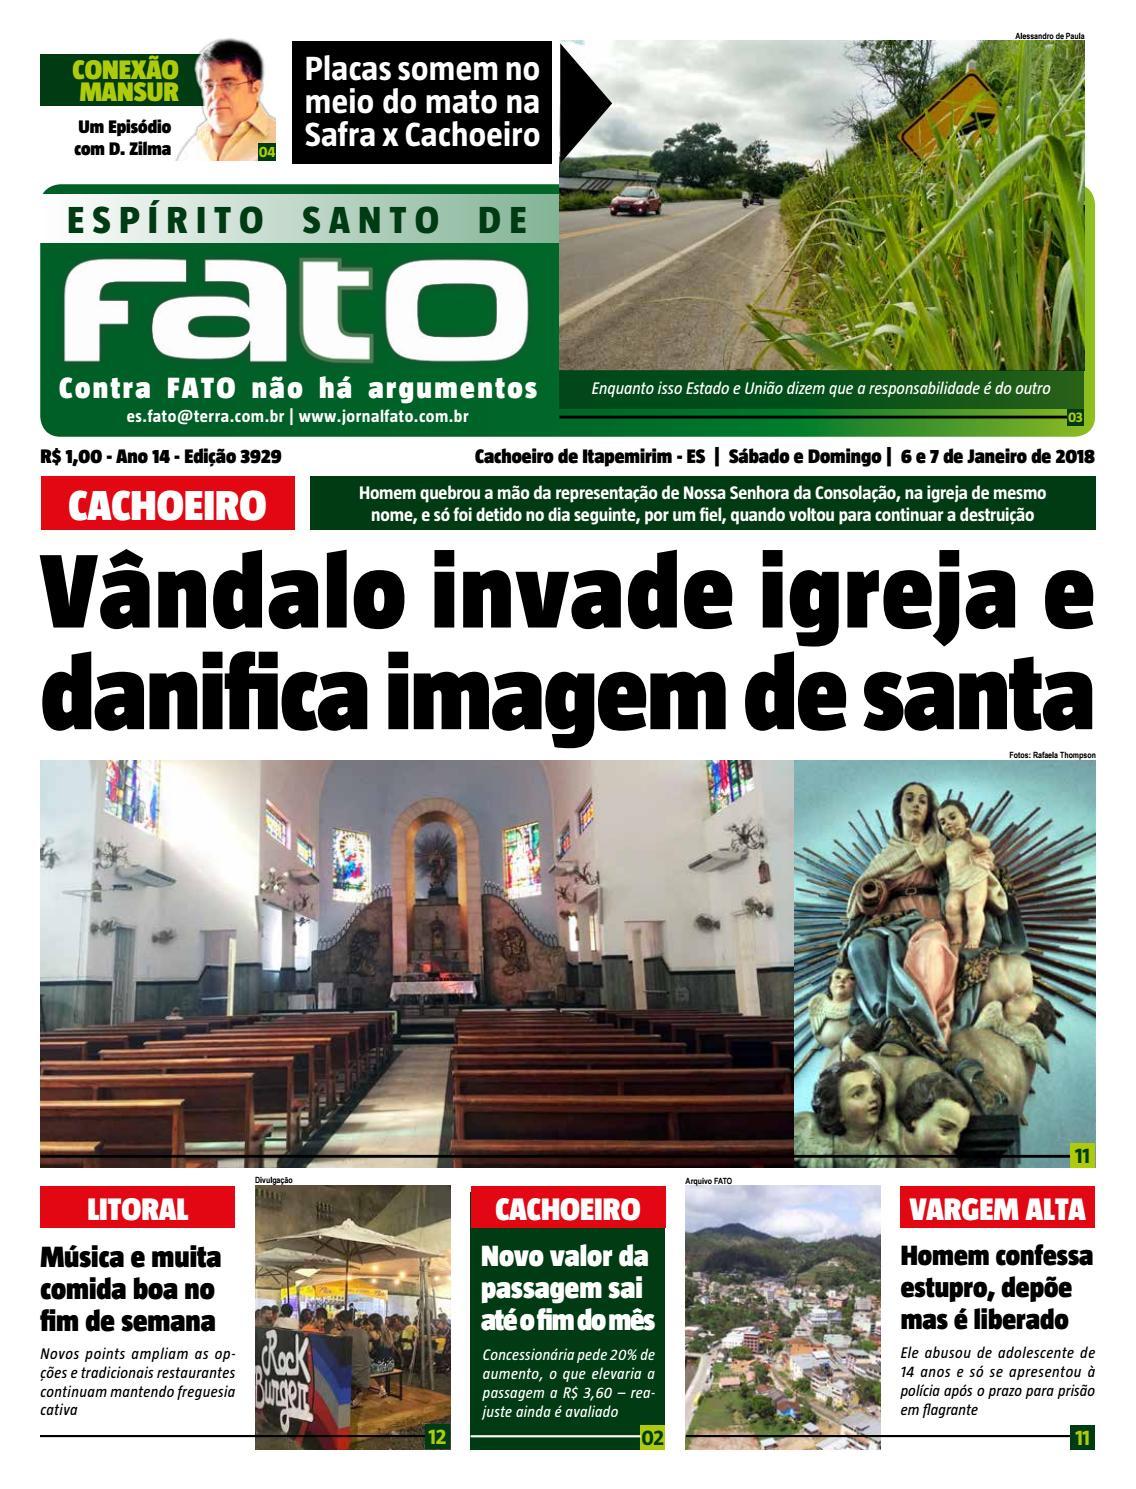 bbf3d2ec3a8d Jornal fato 060701 18 by Jornal Fato - issuu